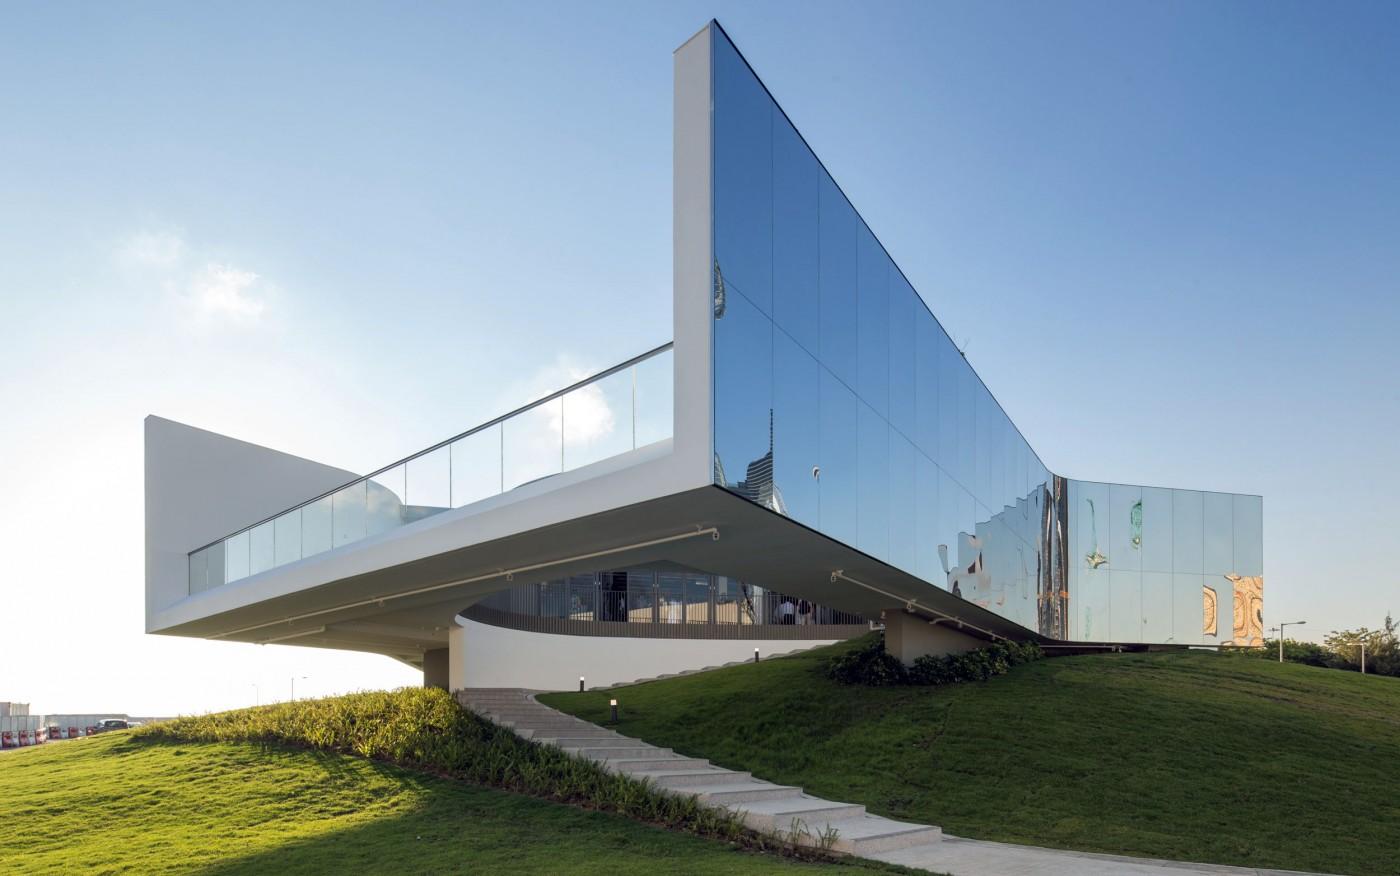 M+視覺文化博物館